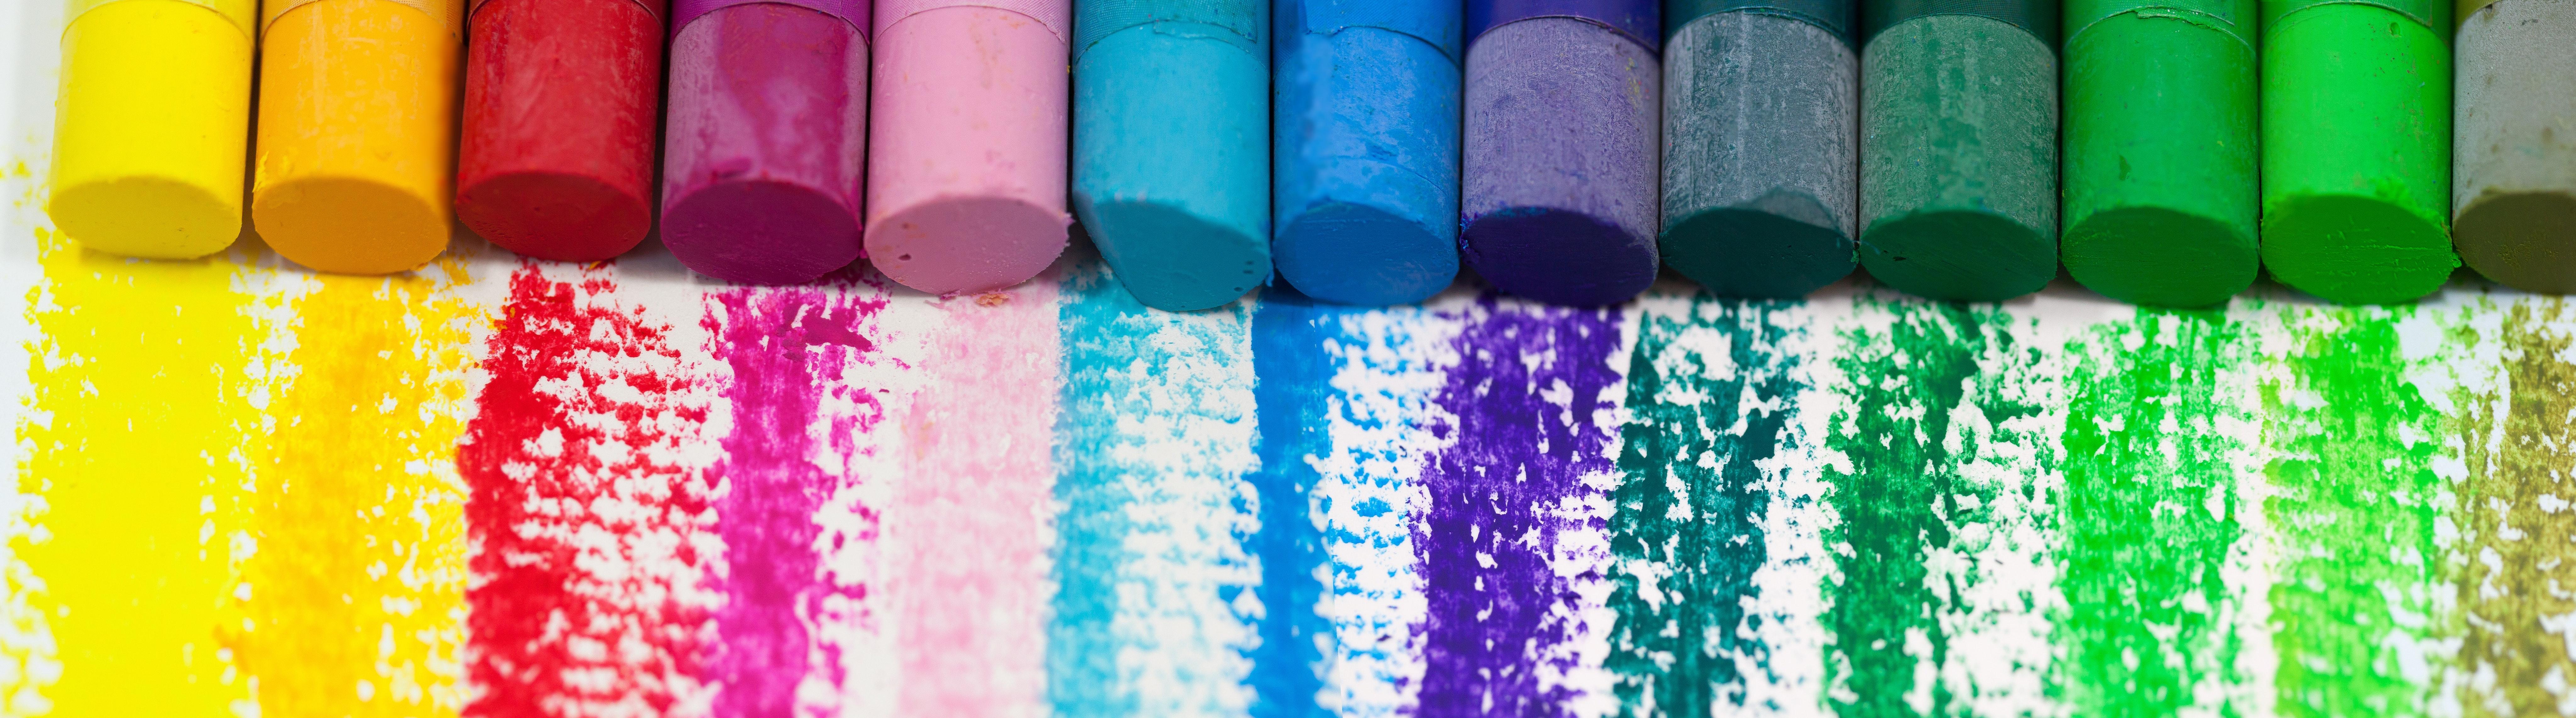 art-artistic-bright-268435